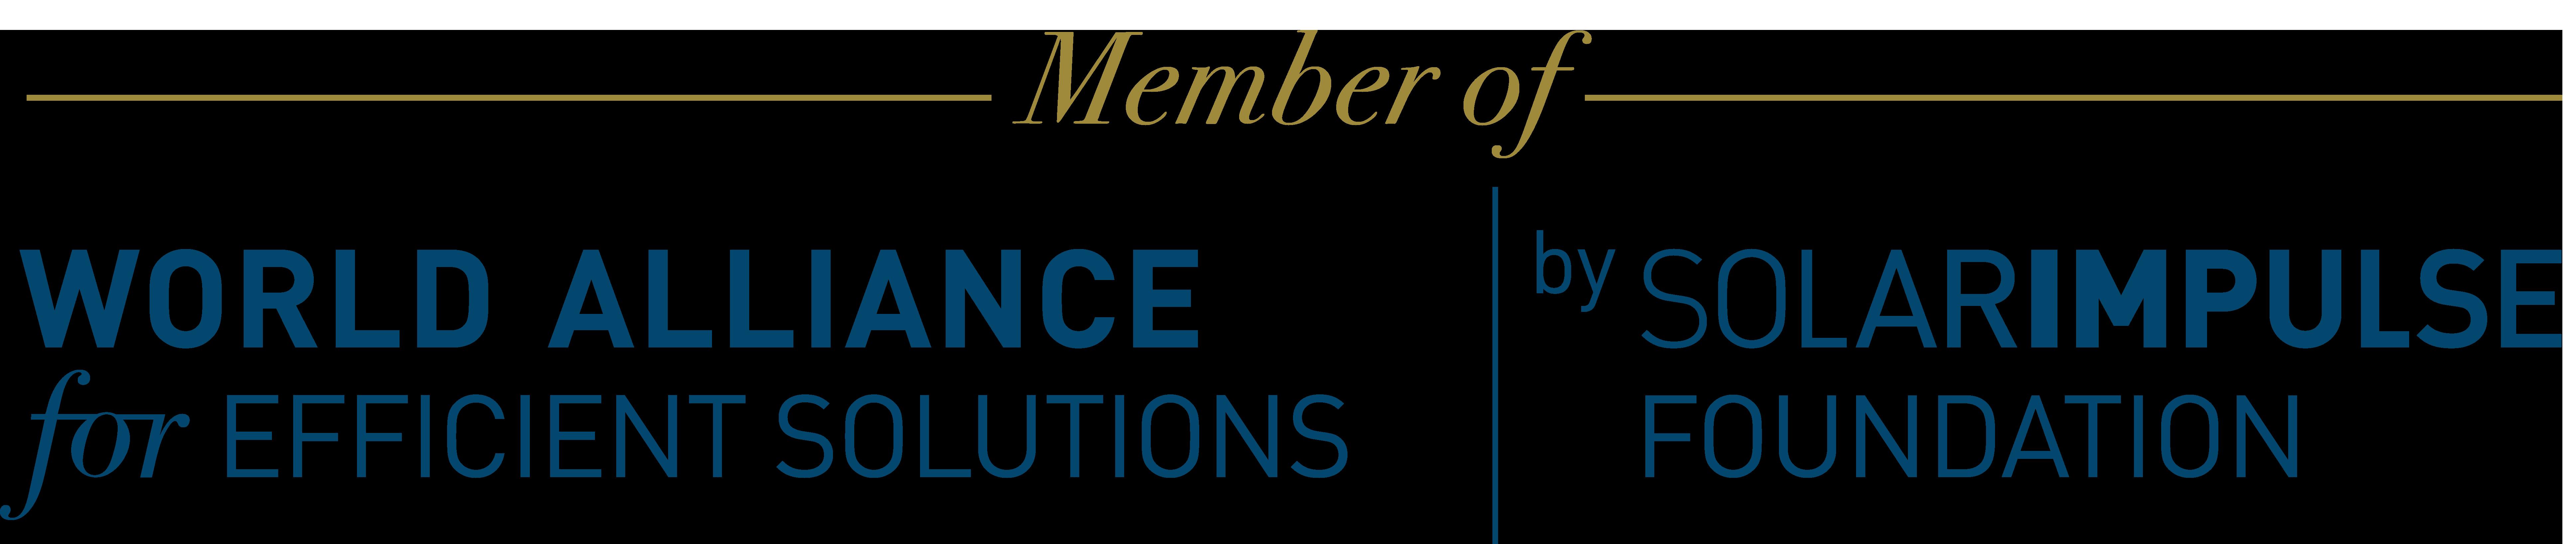 APELEON is member of SOLAR IMPULSE Foundation